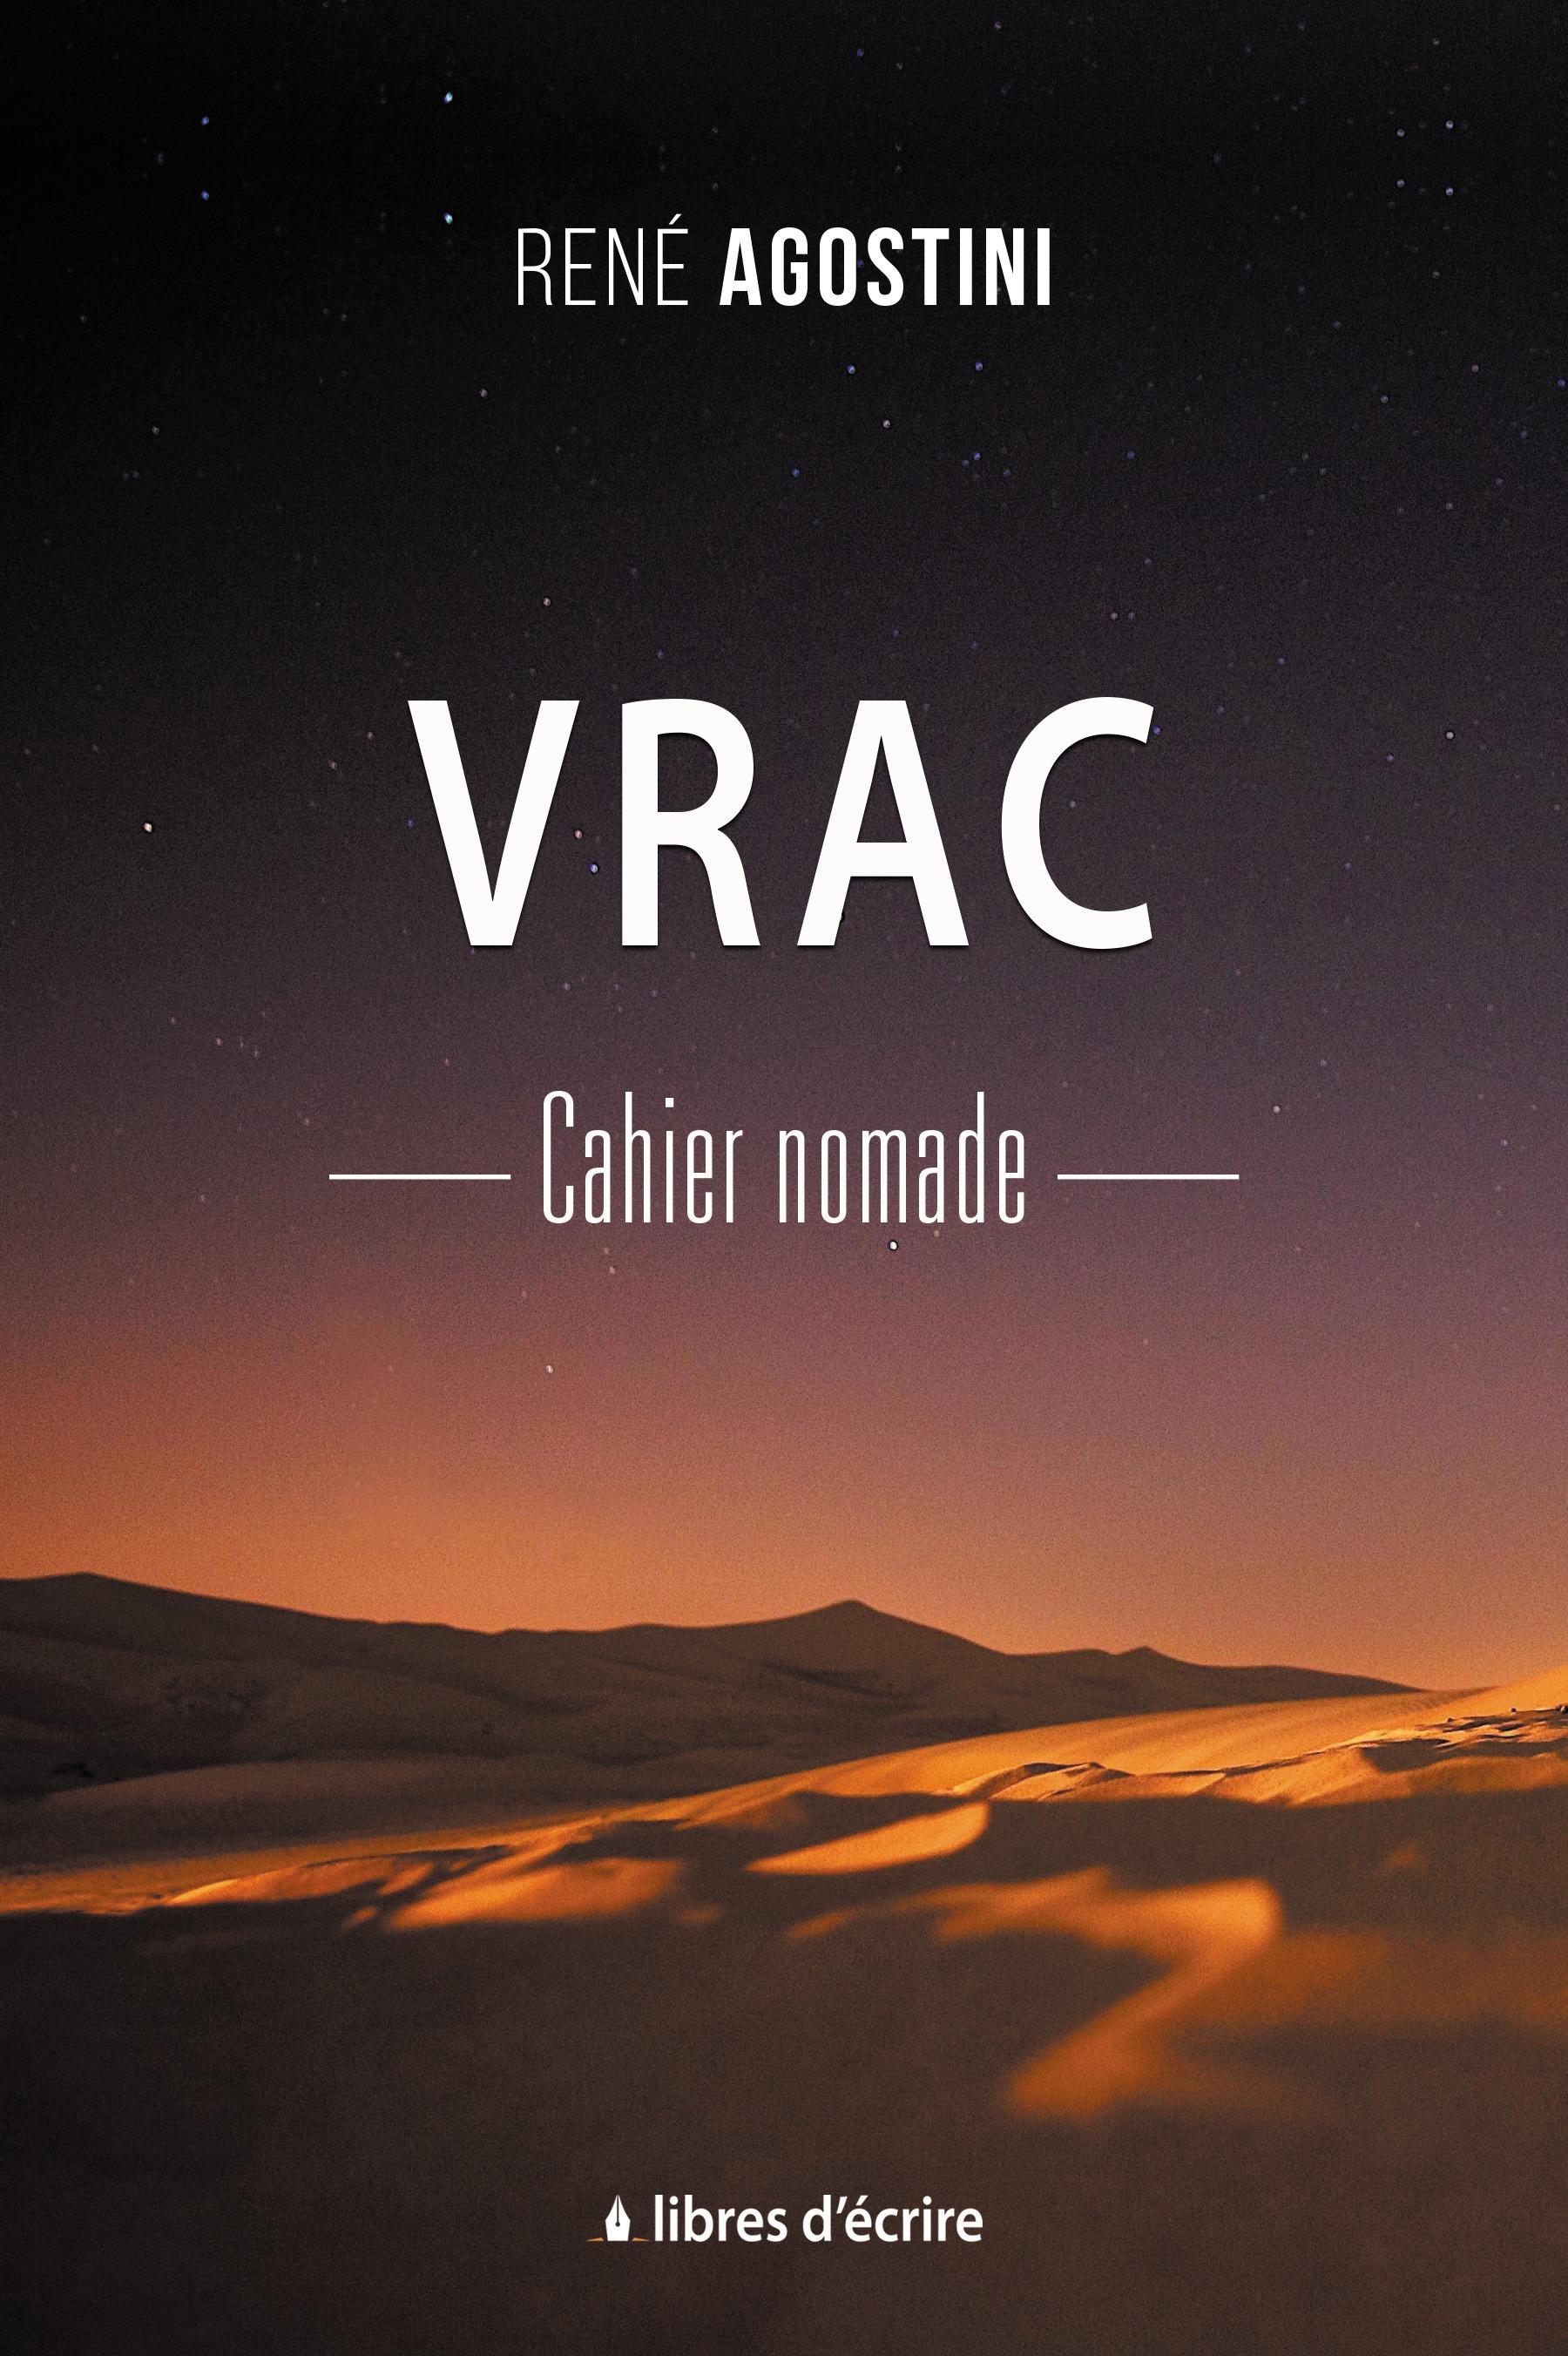 Vrac : Cahier nomade